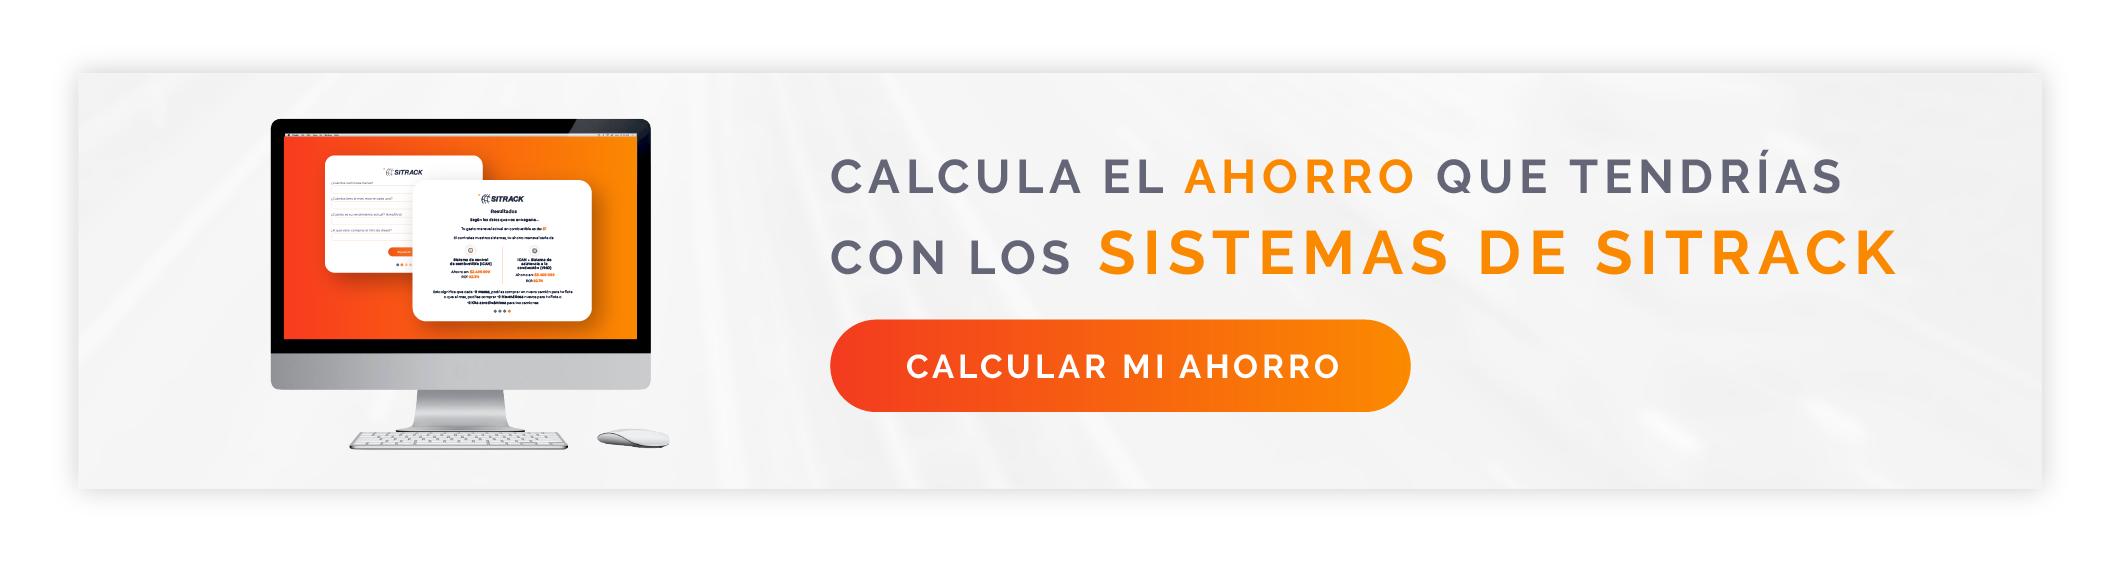 llamado a calculadora